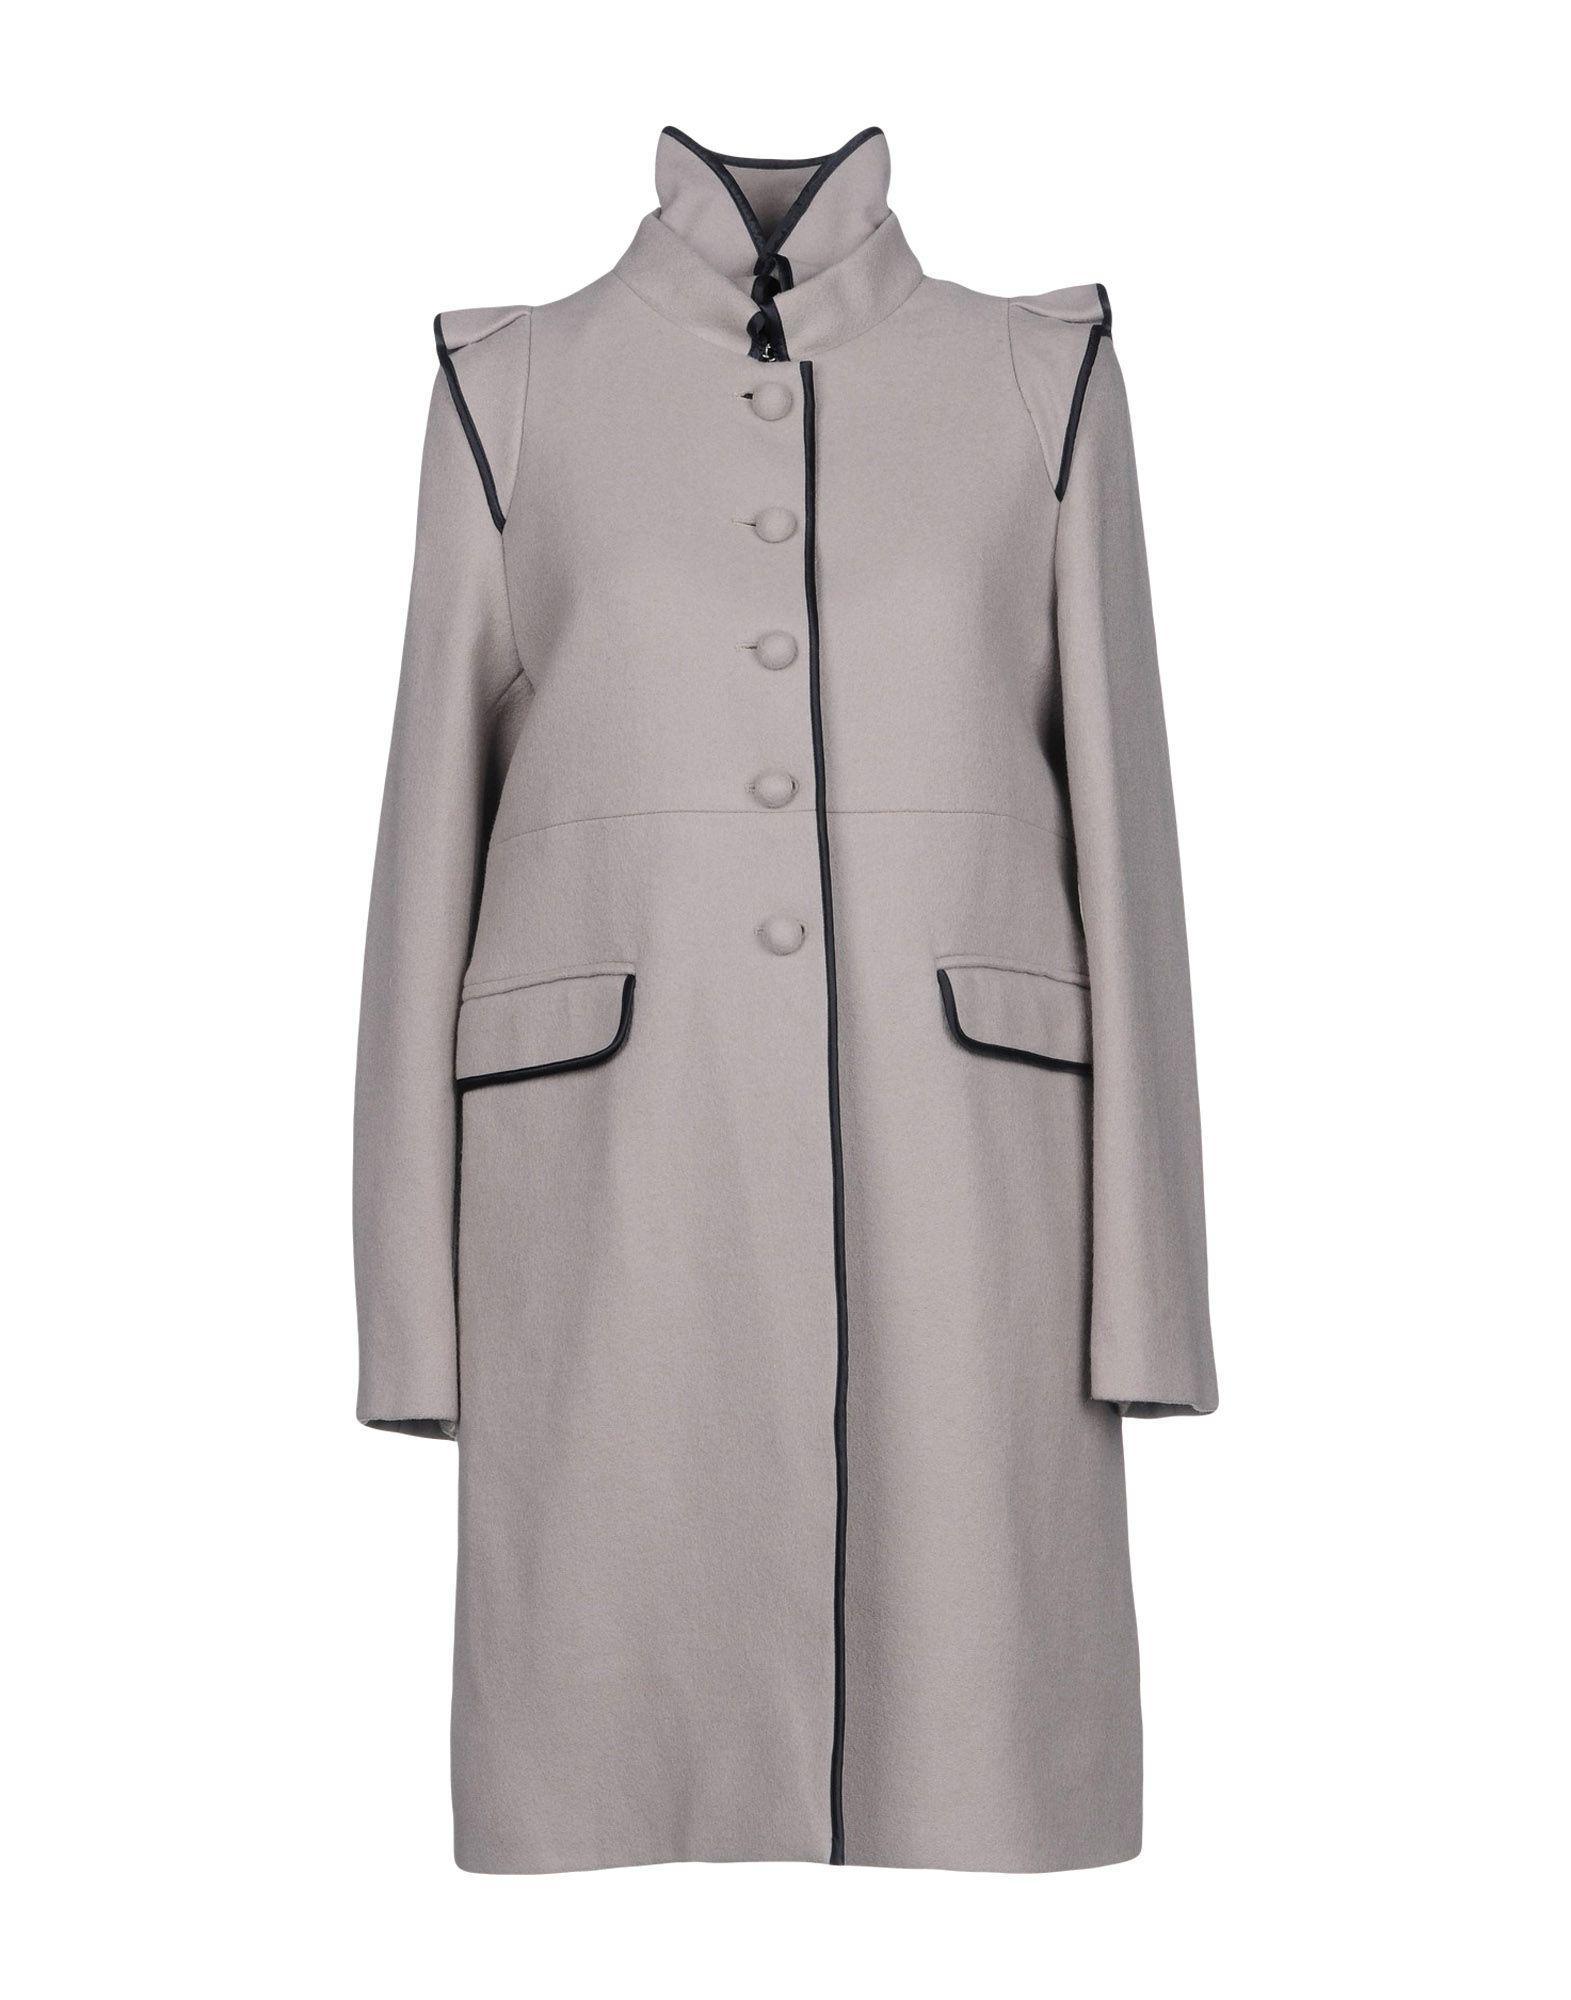 Valentino Coat In Light Grey